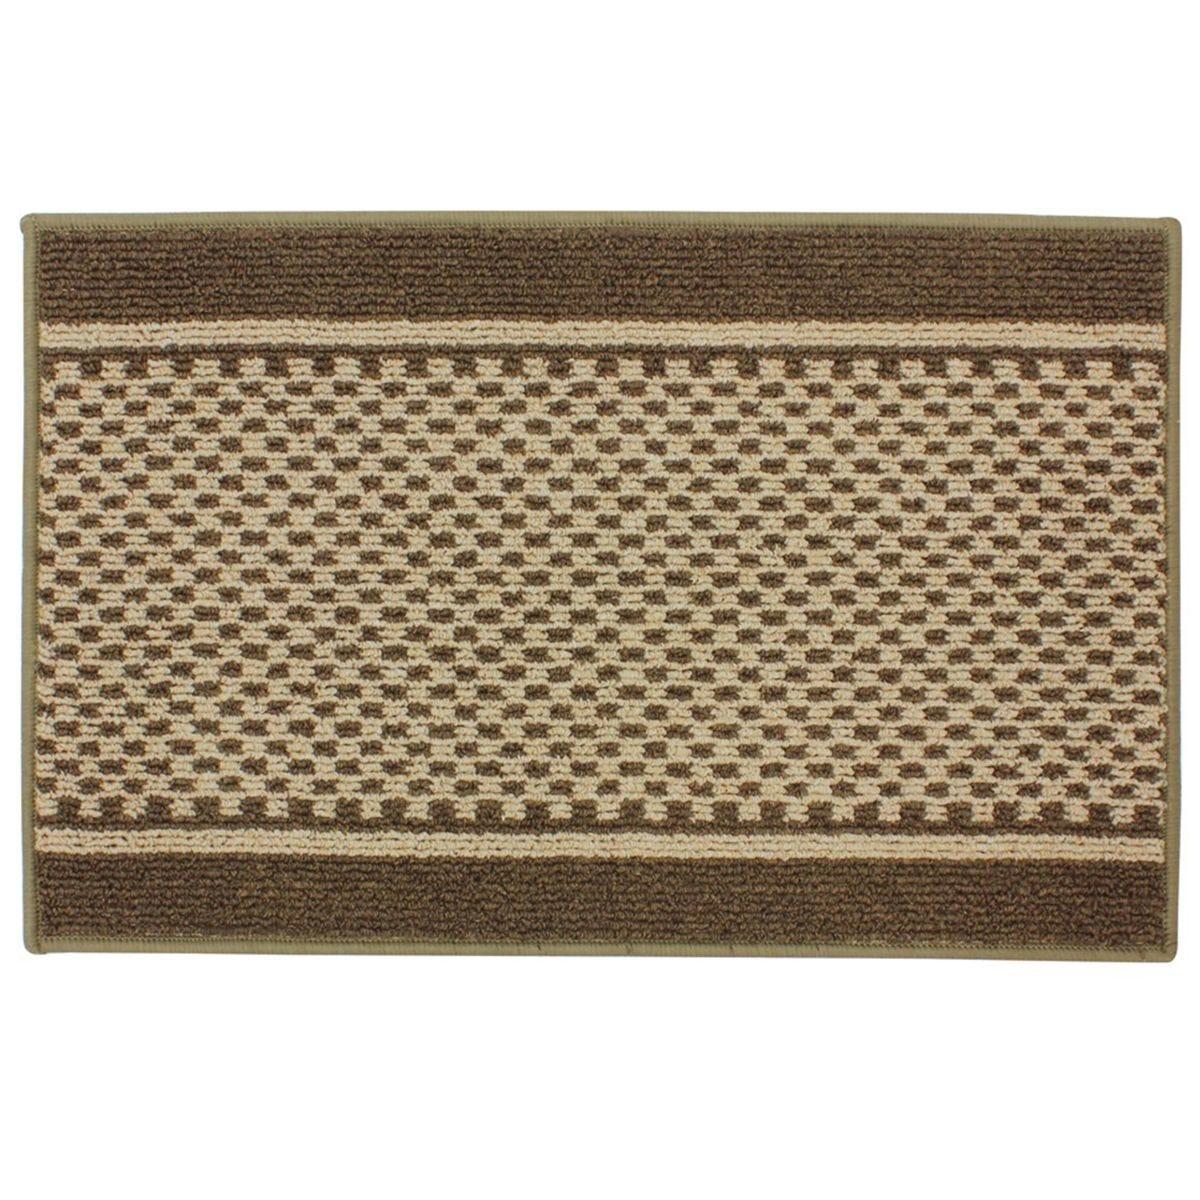 JVL 50x80cm Bologna Entrance Doormat - Brown/Beige